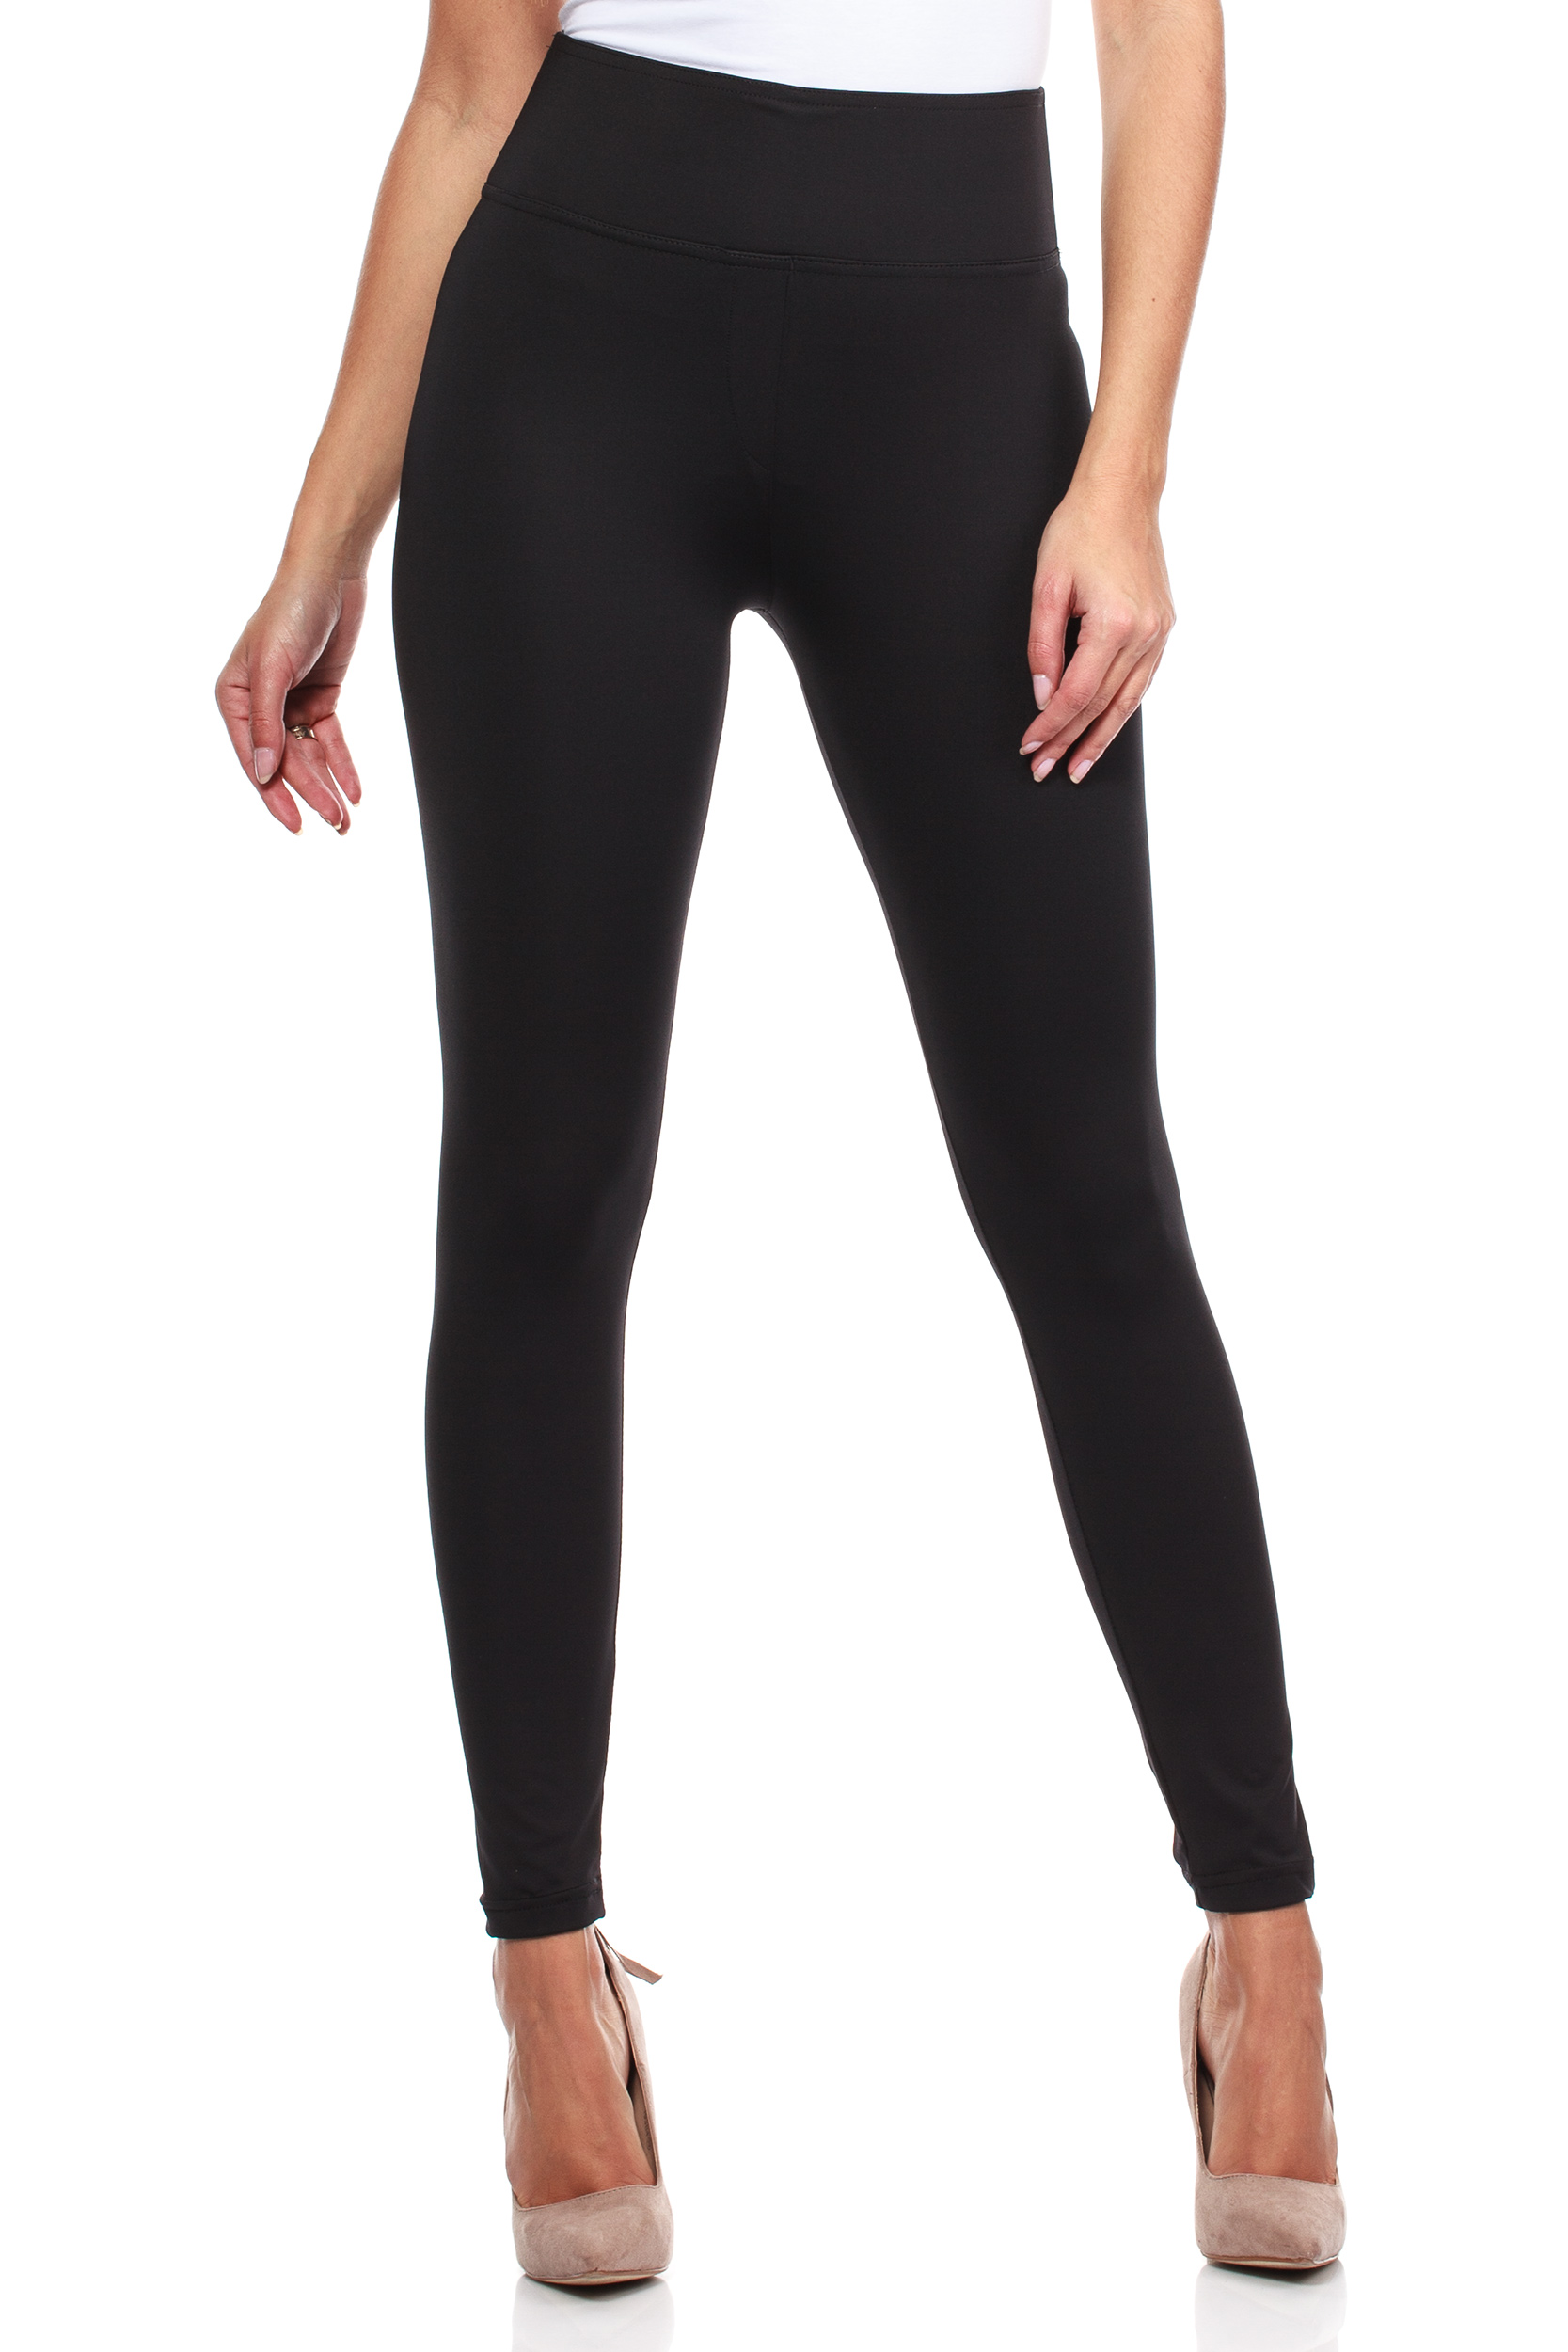 CM3950 Dopasowane legginsy antycellulitowe plus size - czarne